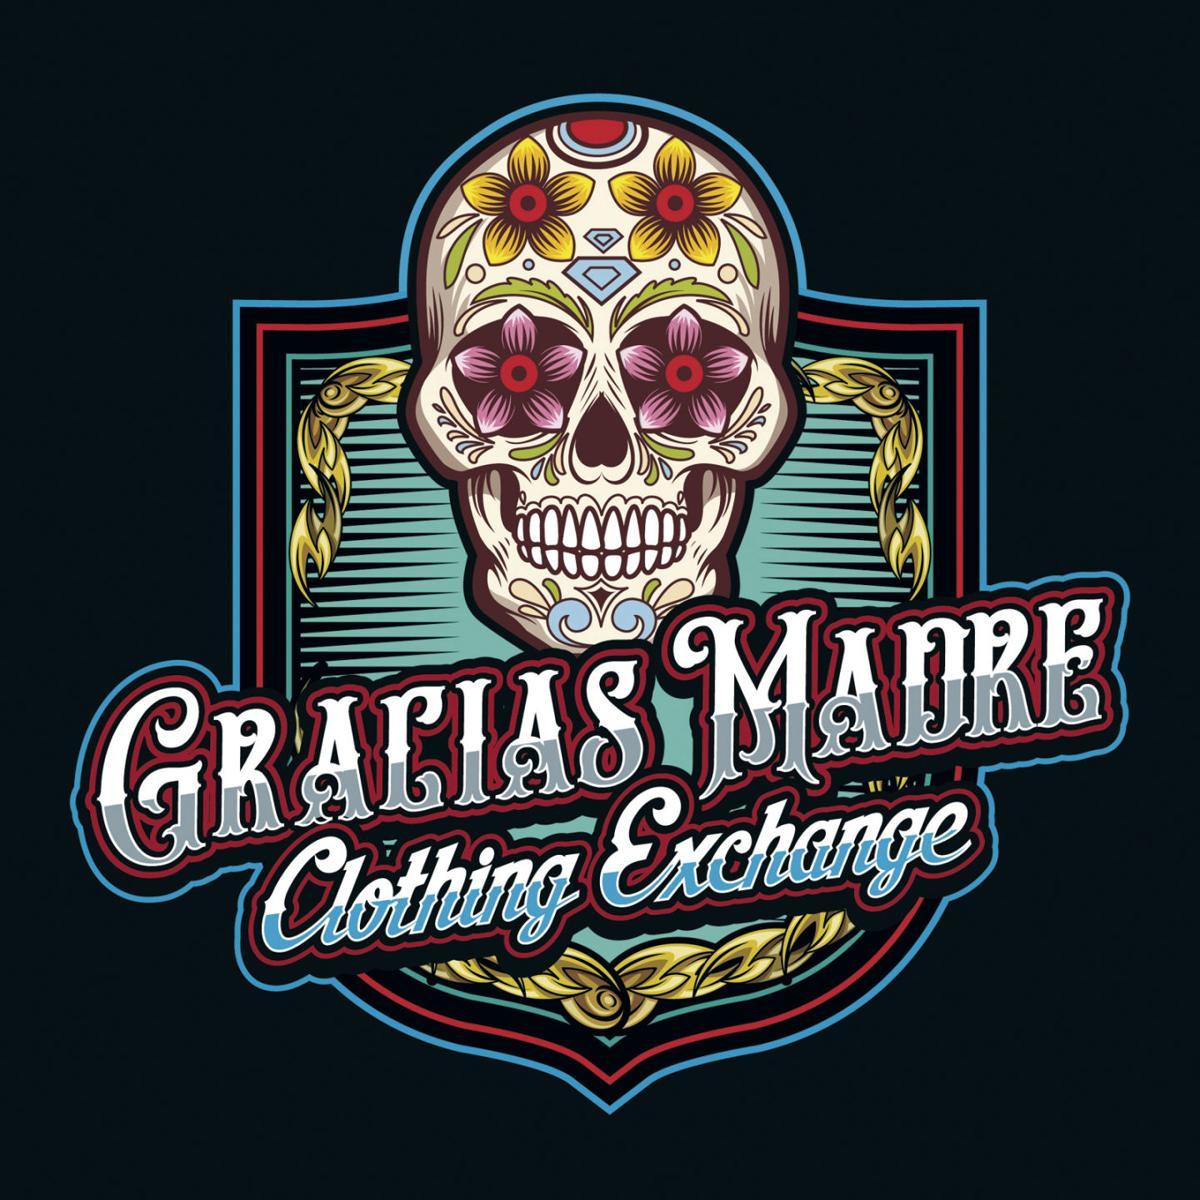 Gracias Madre Clothing Exchange